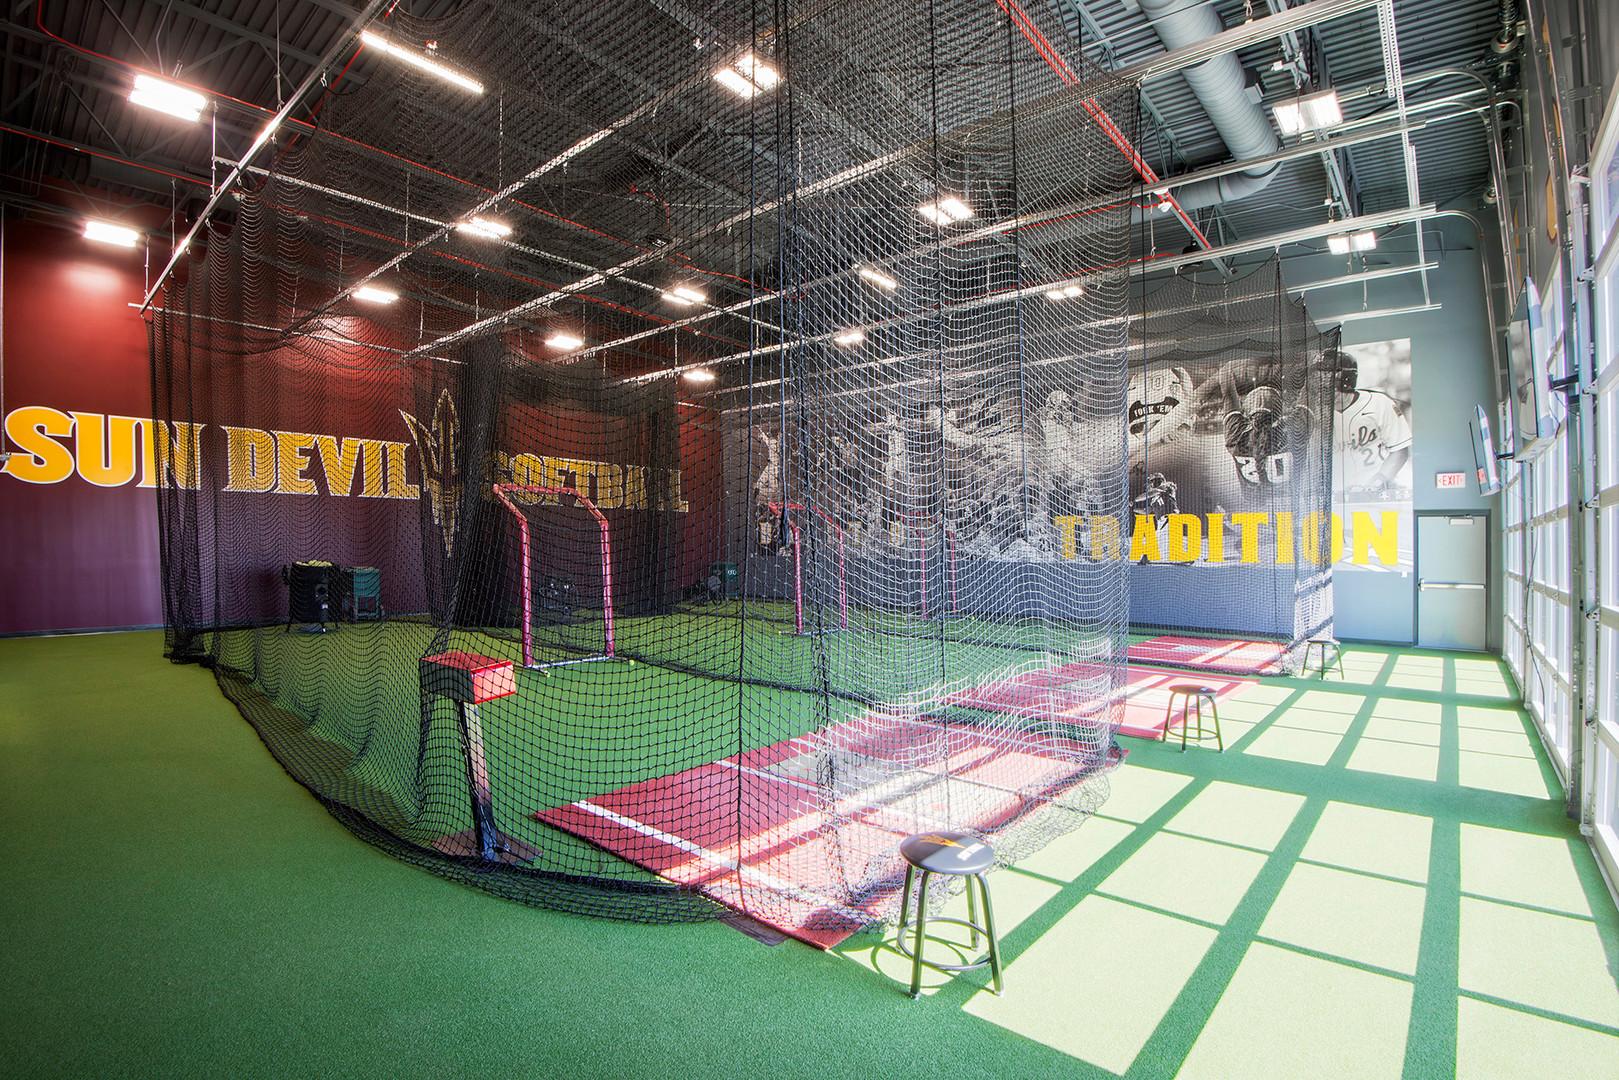 ASU Softball-08 new.jpg